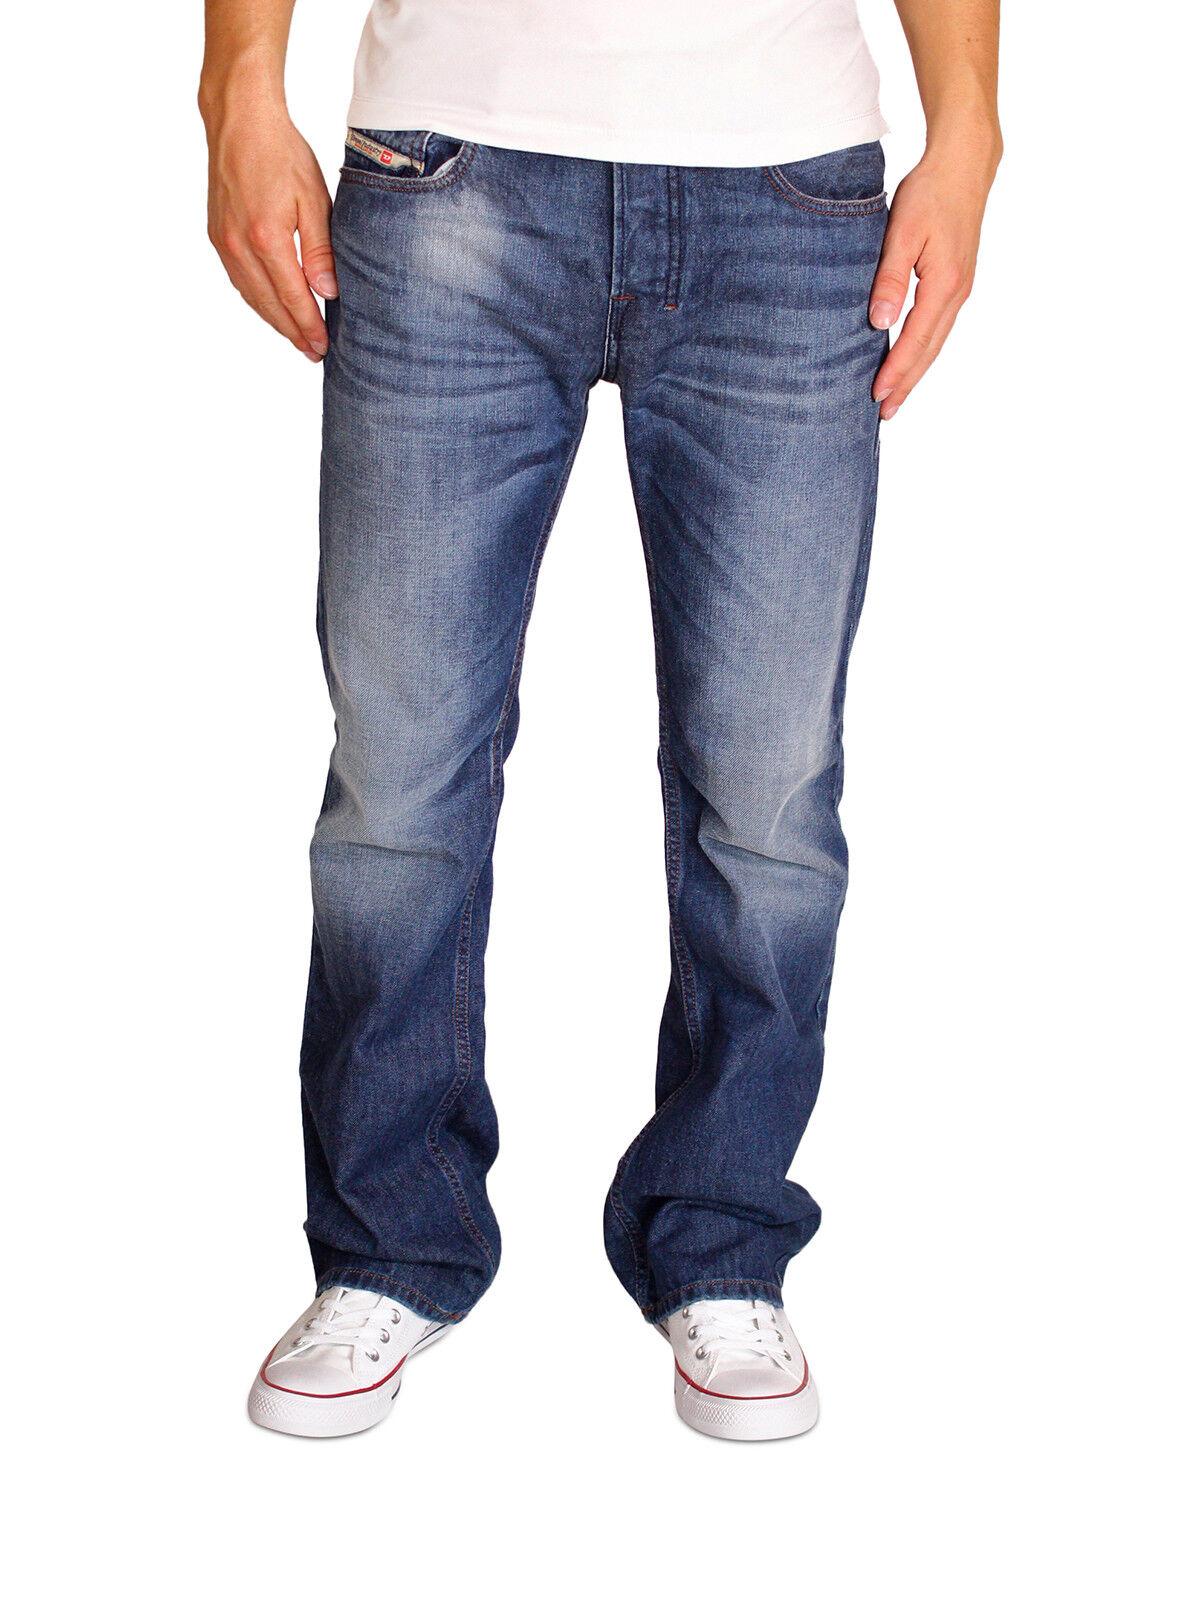 Diesel Jeans Zatiny 0842C 0842C 0842C  Herren Hose Regular Stiefel Cut Stiefelcut Dunkelblau NEU 151cac